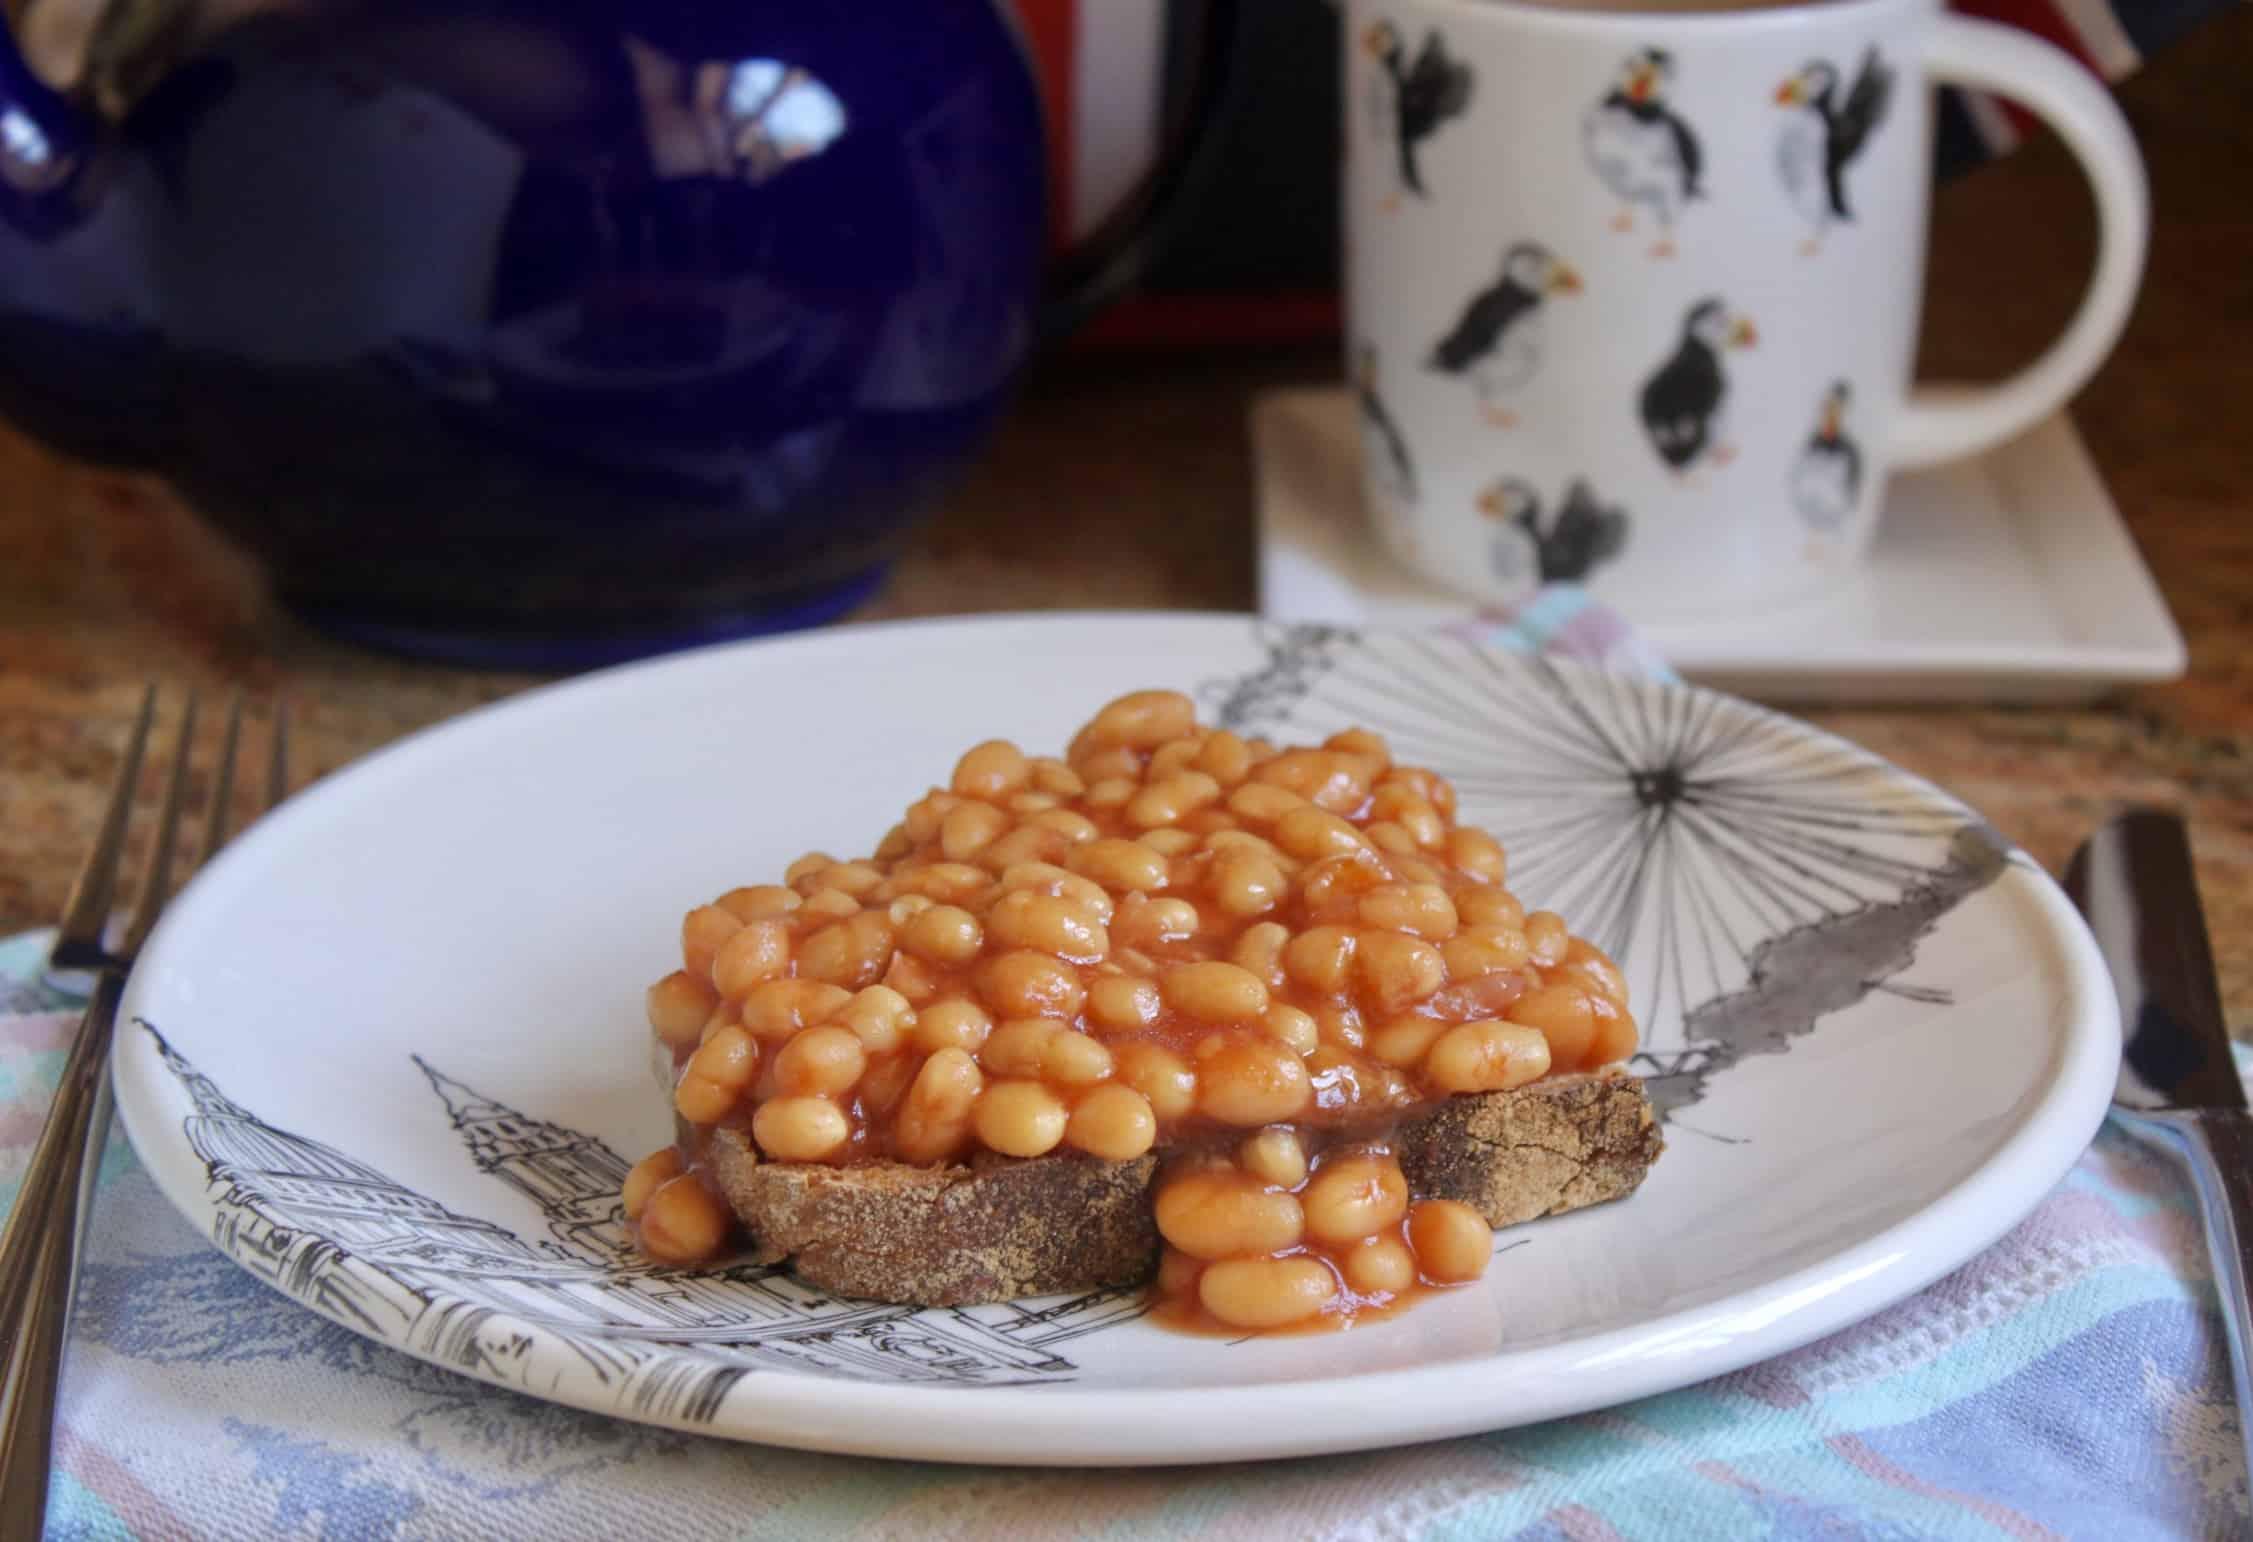 lunch plate with teapot and tea mug